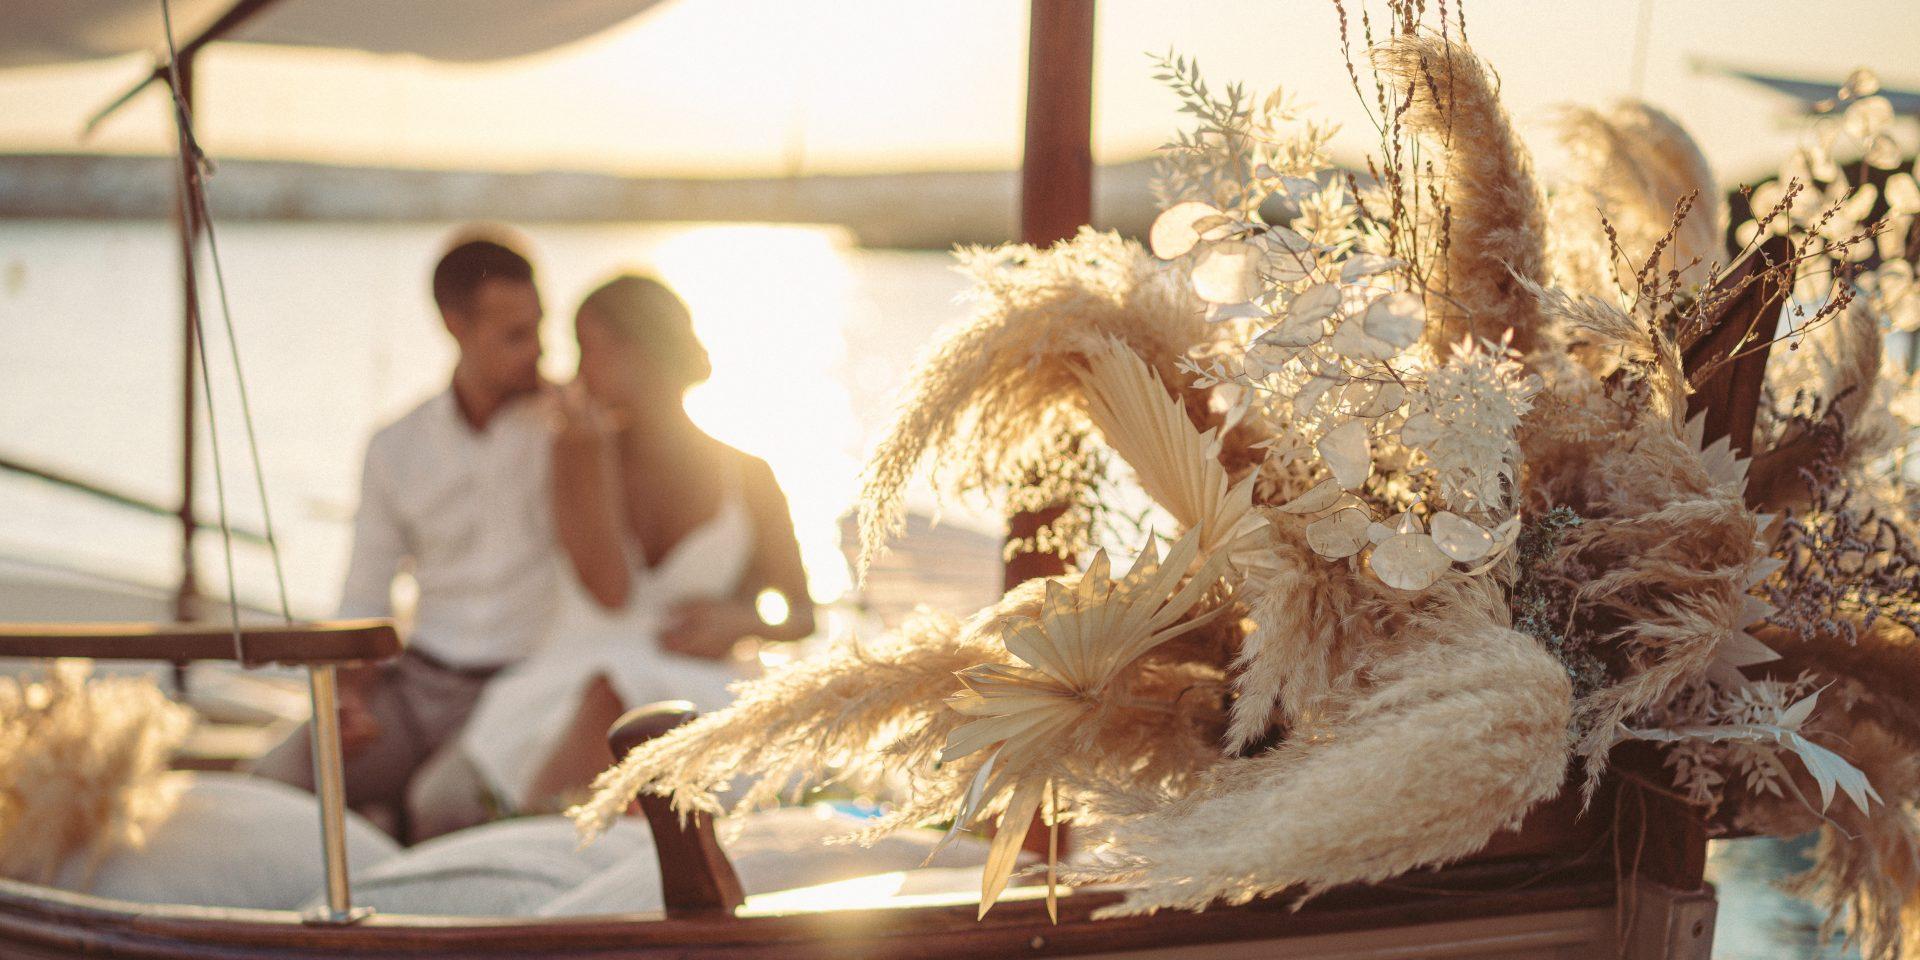 Ferran Florista | Wedding and event photographer and videographer in Menorca and Mallorca